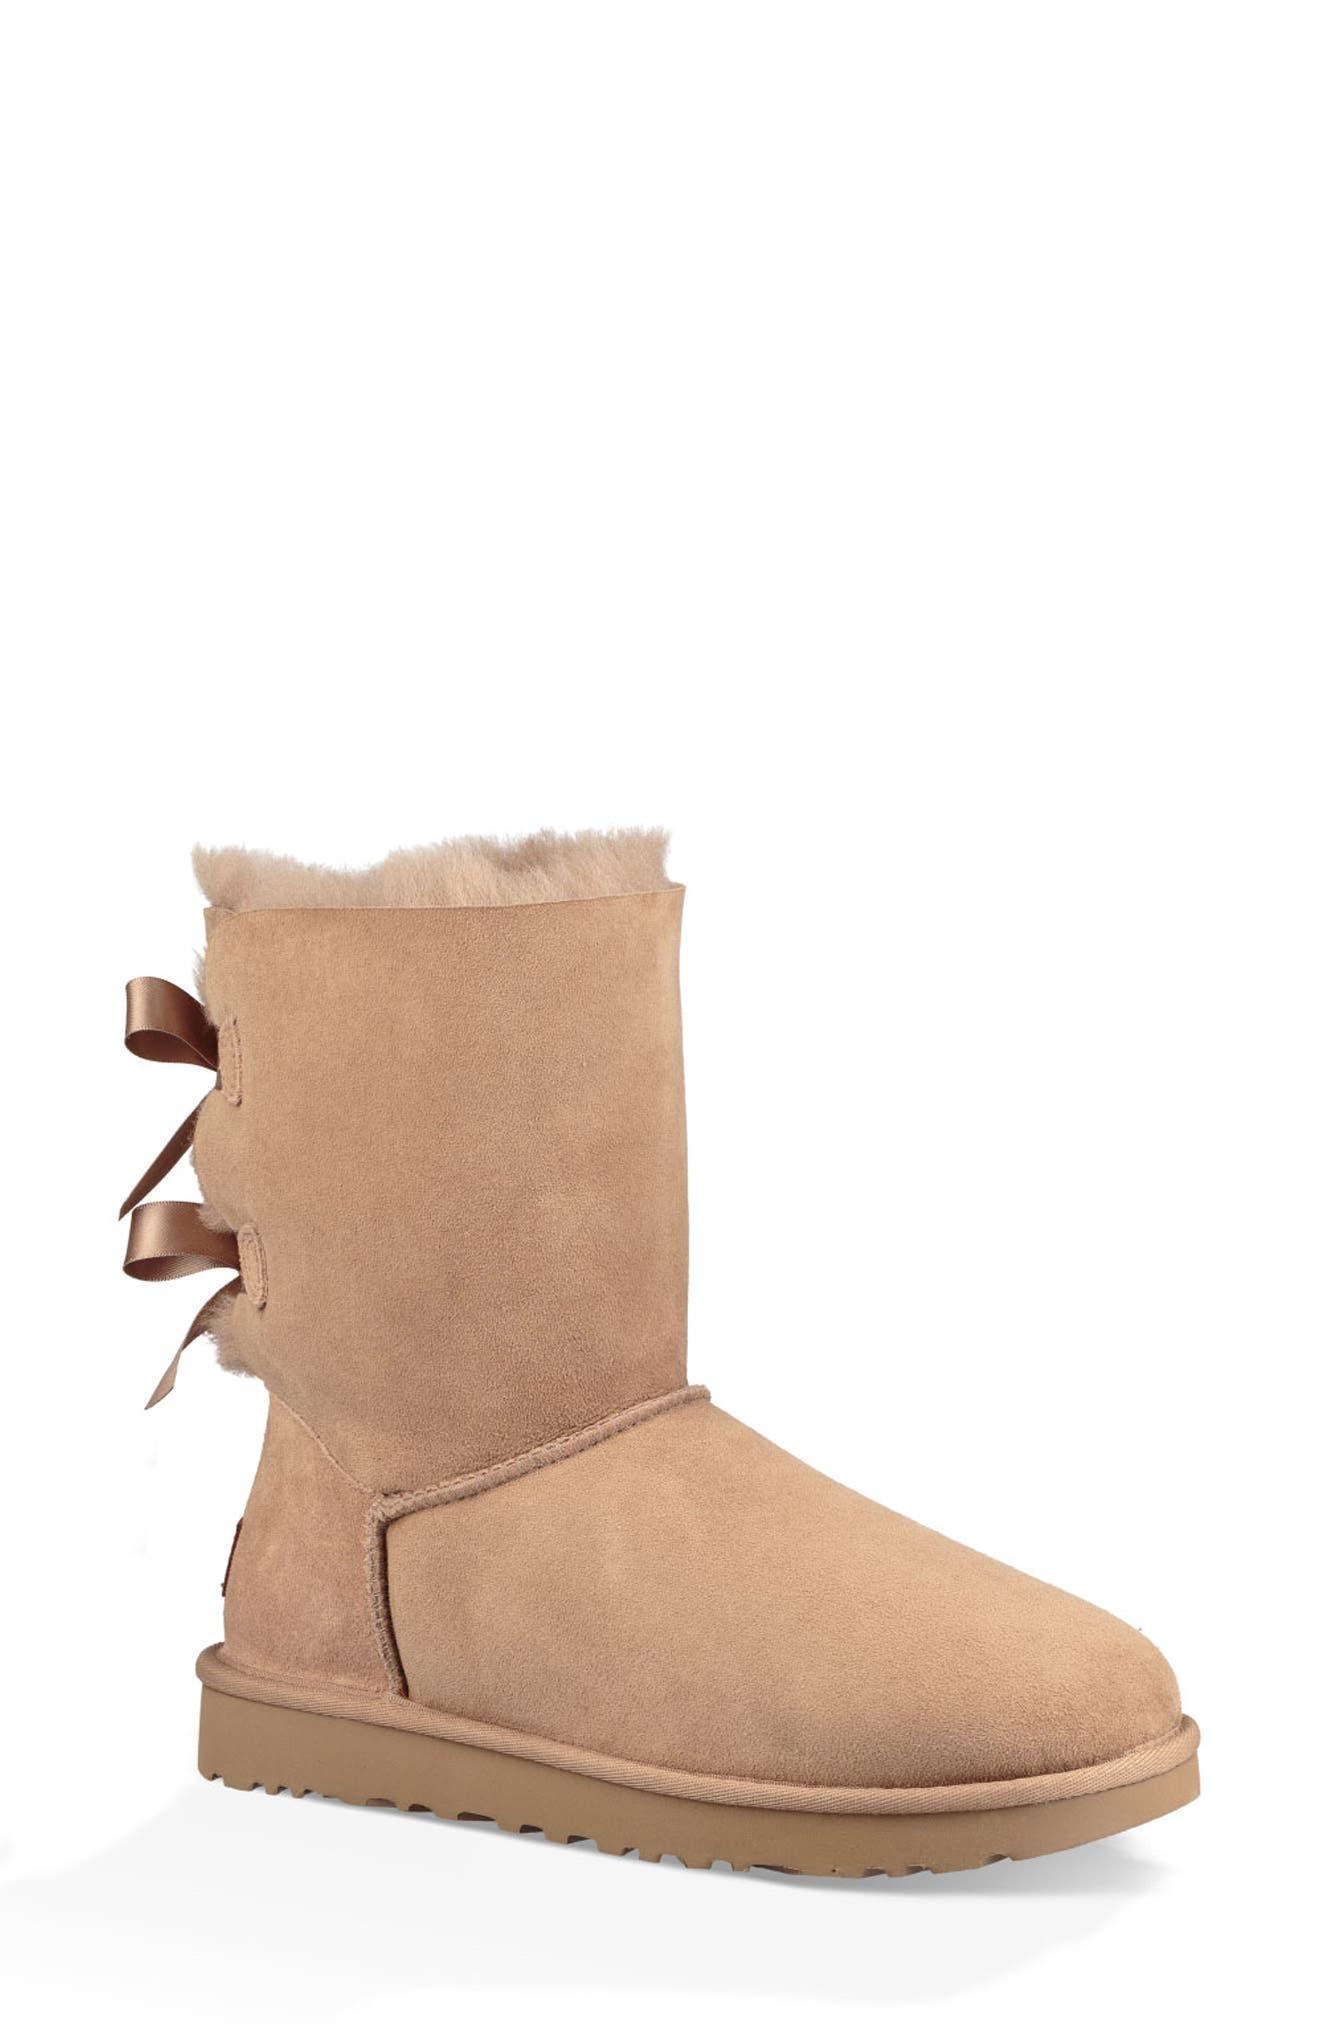 'Bailey Bow II' Boot,                             Main thumbnail 1, color,                             FAWN